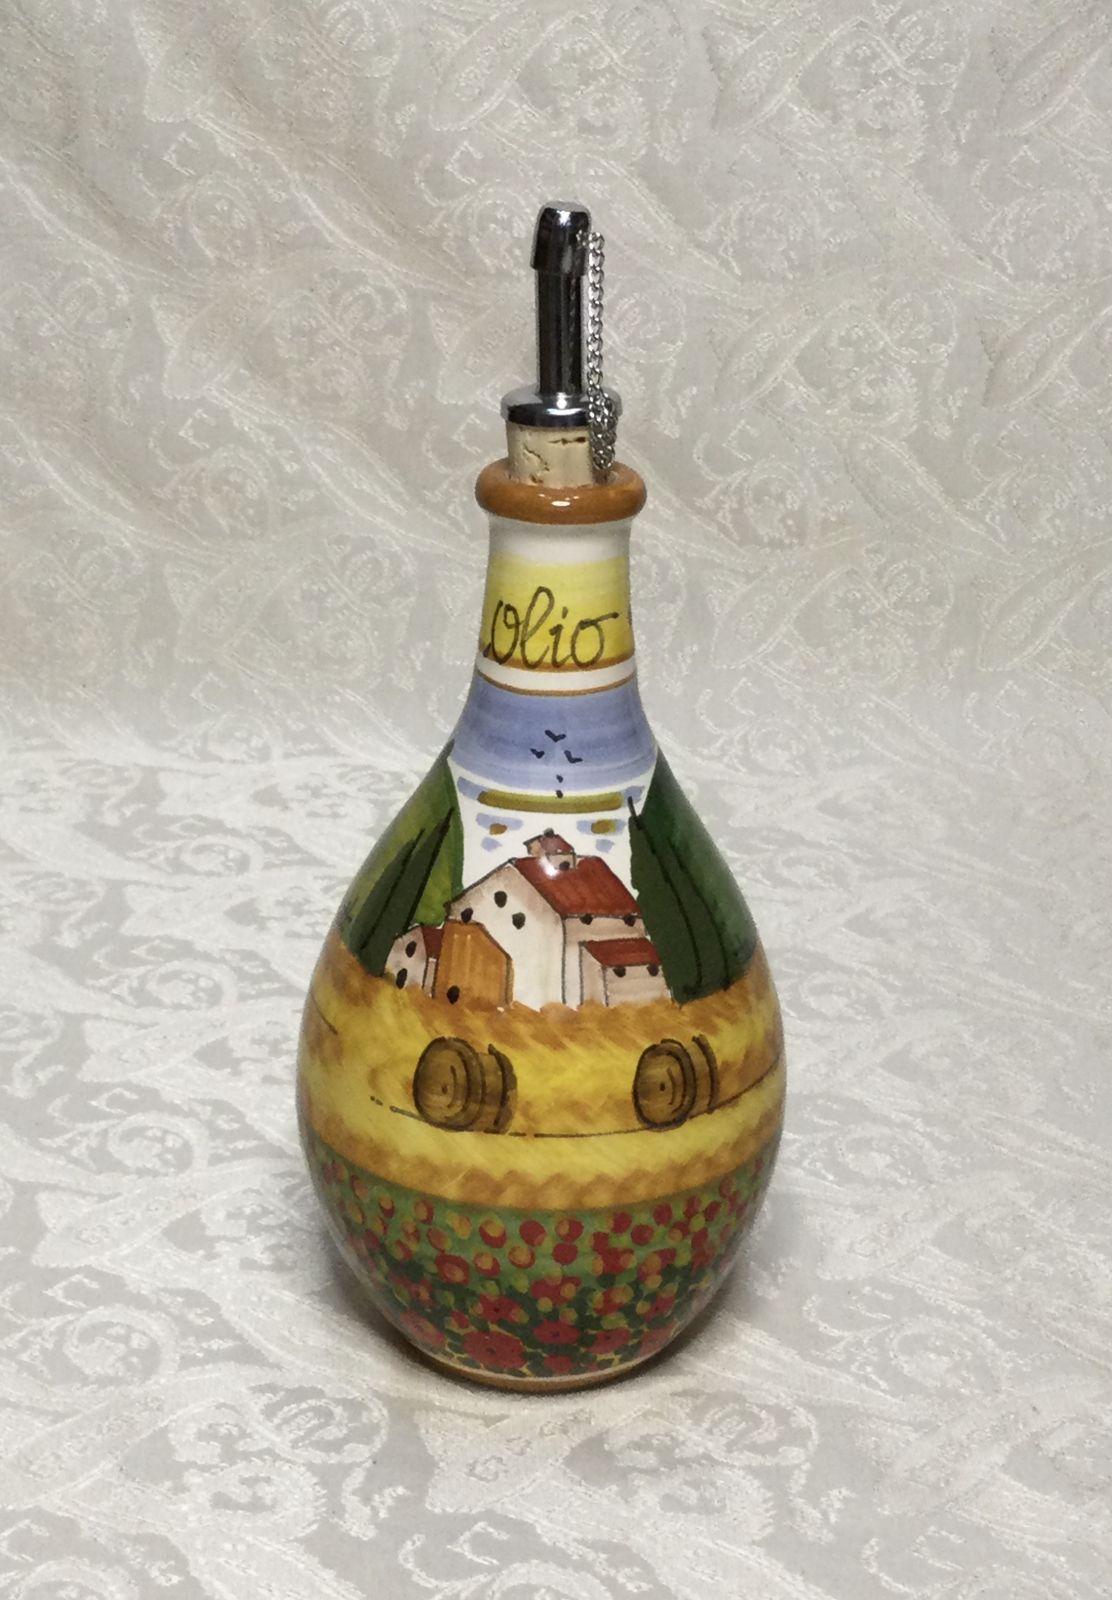 Ampolla olio h18 paesaggio toscano con papaveri bordo arancio